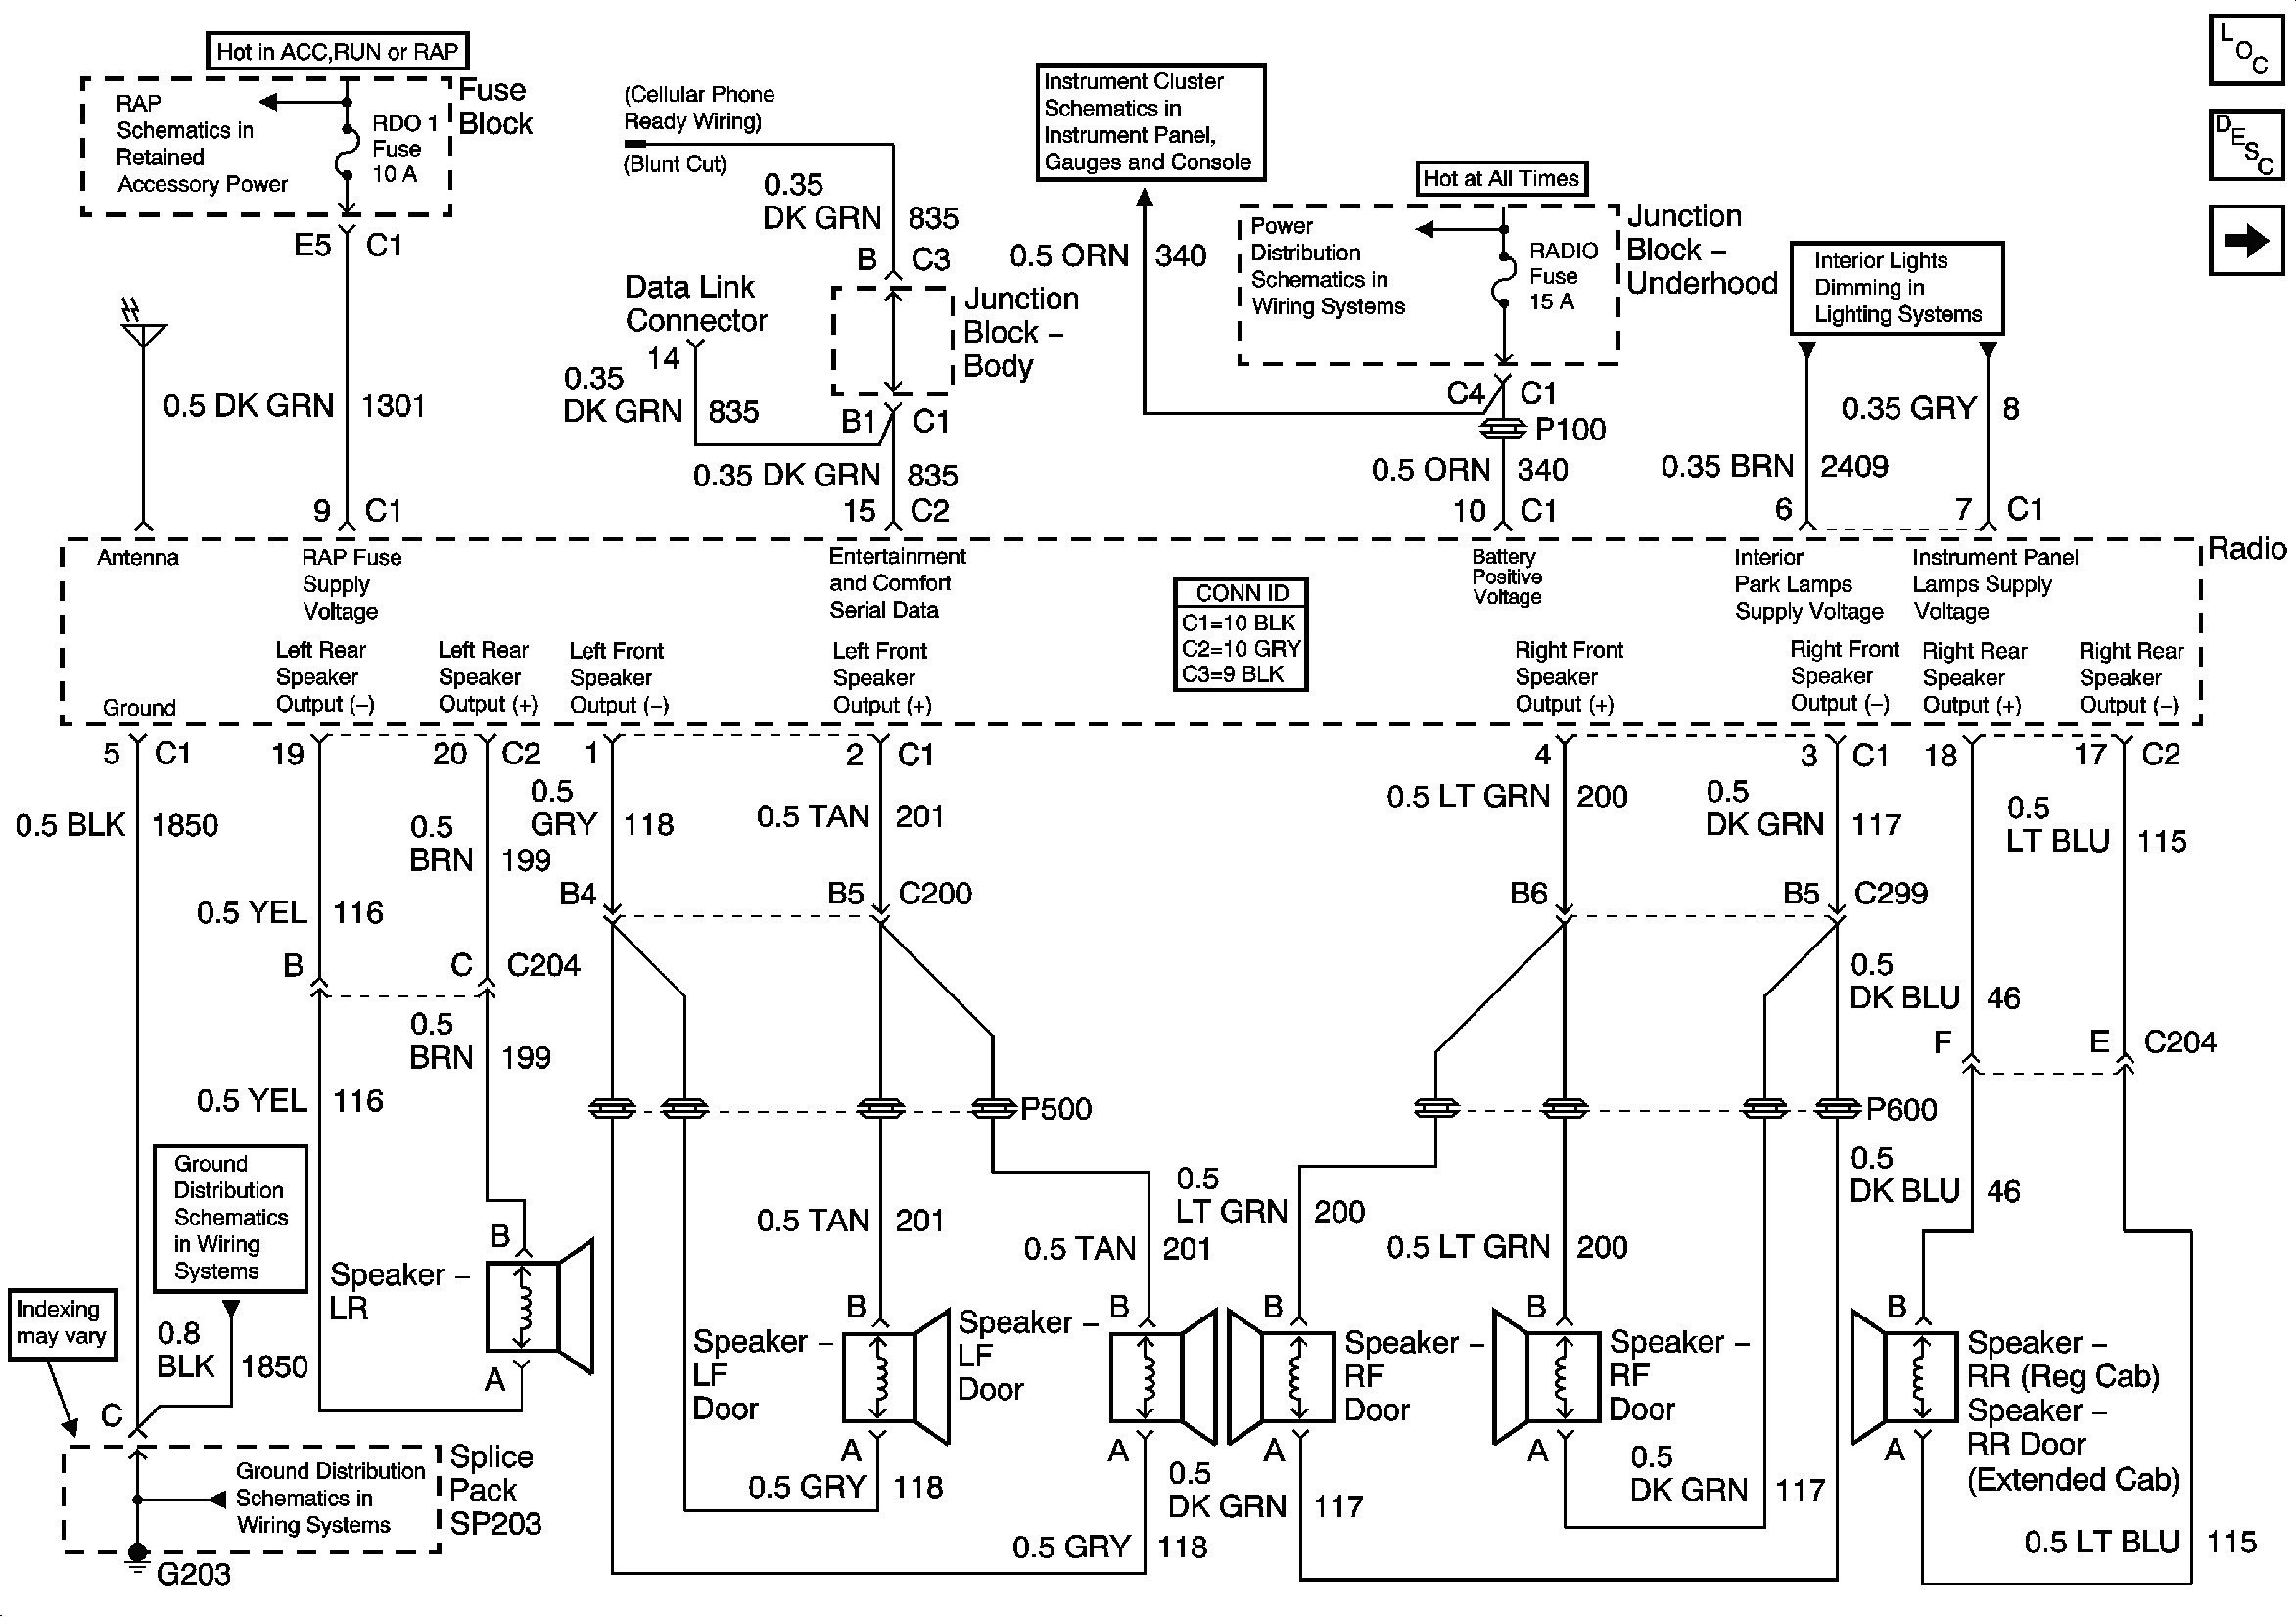 Xw 5143 Chevy Cavalier Wiring Diagram 2000 Chevy Cavalier Wiring Diagram Schematic Wiring